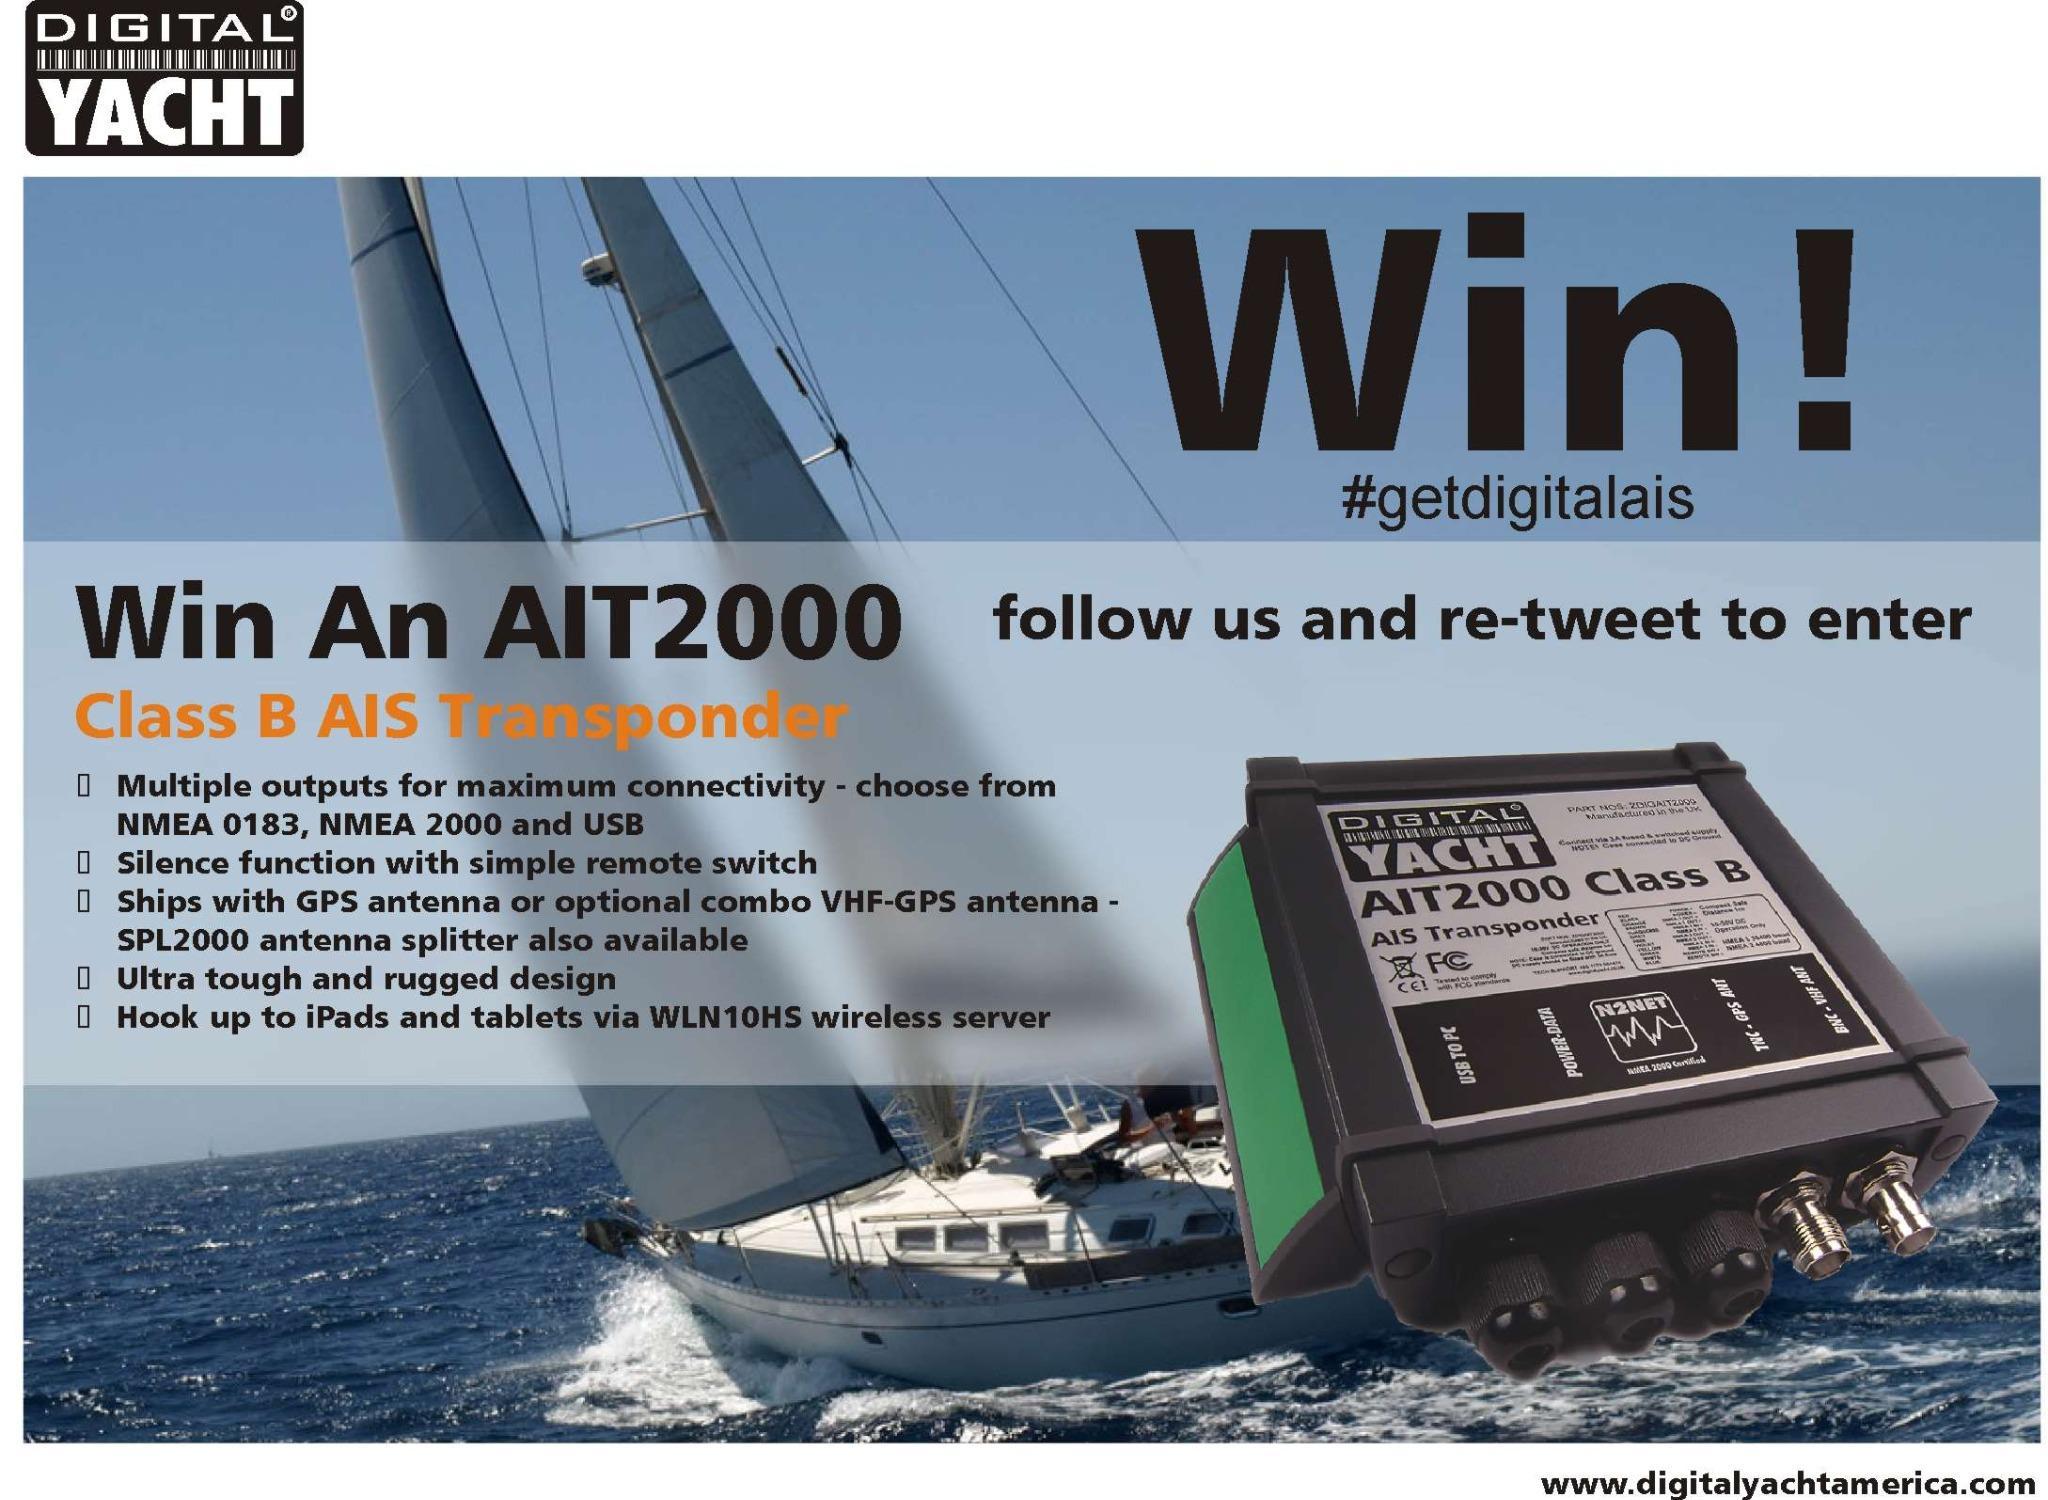 Digital Yacht on Twitter: